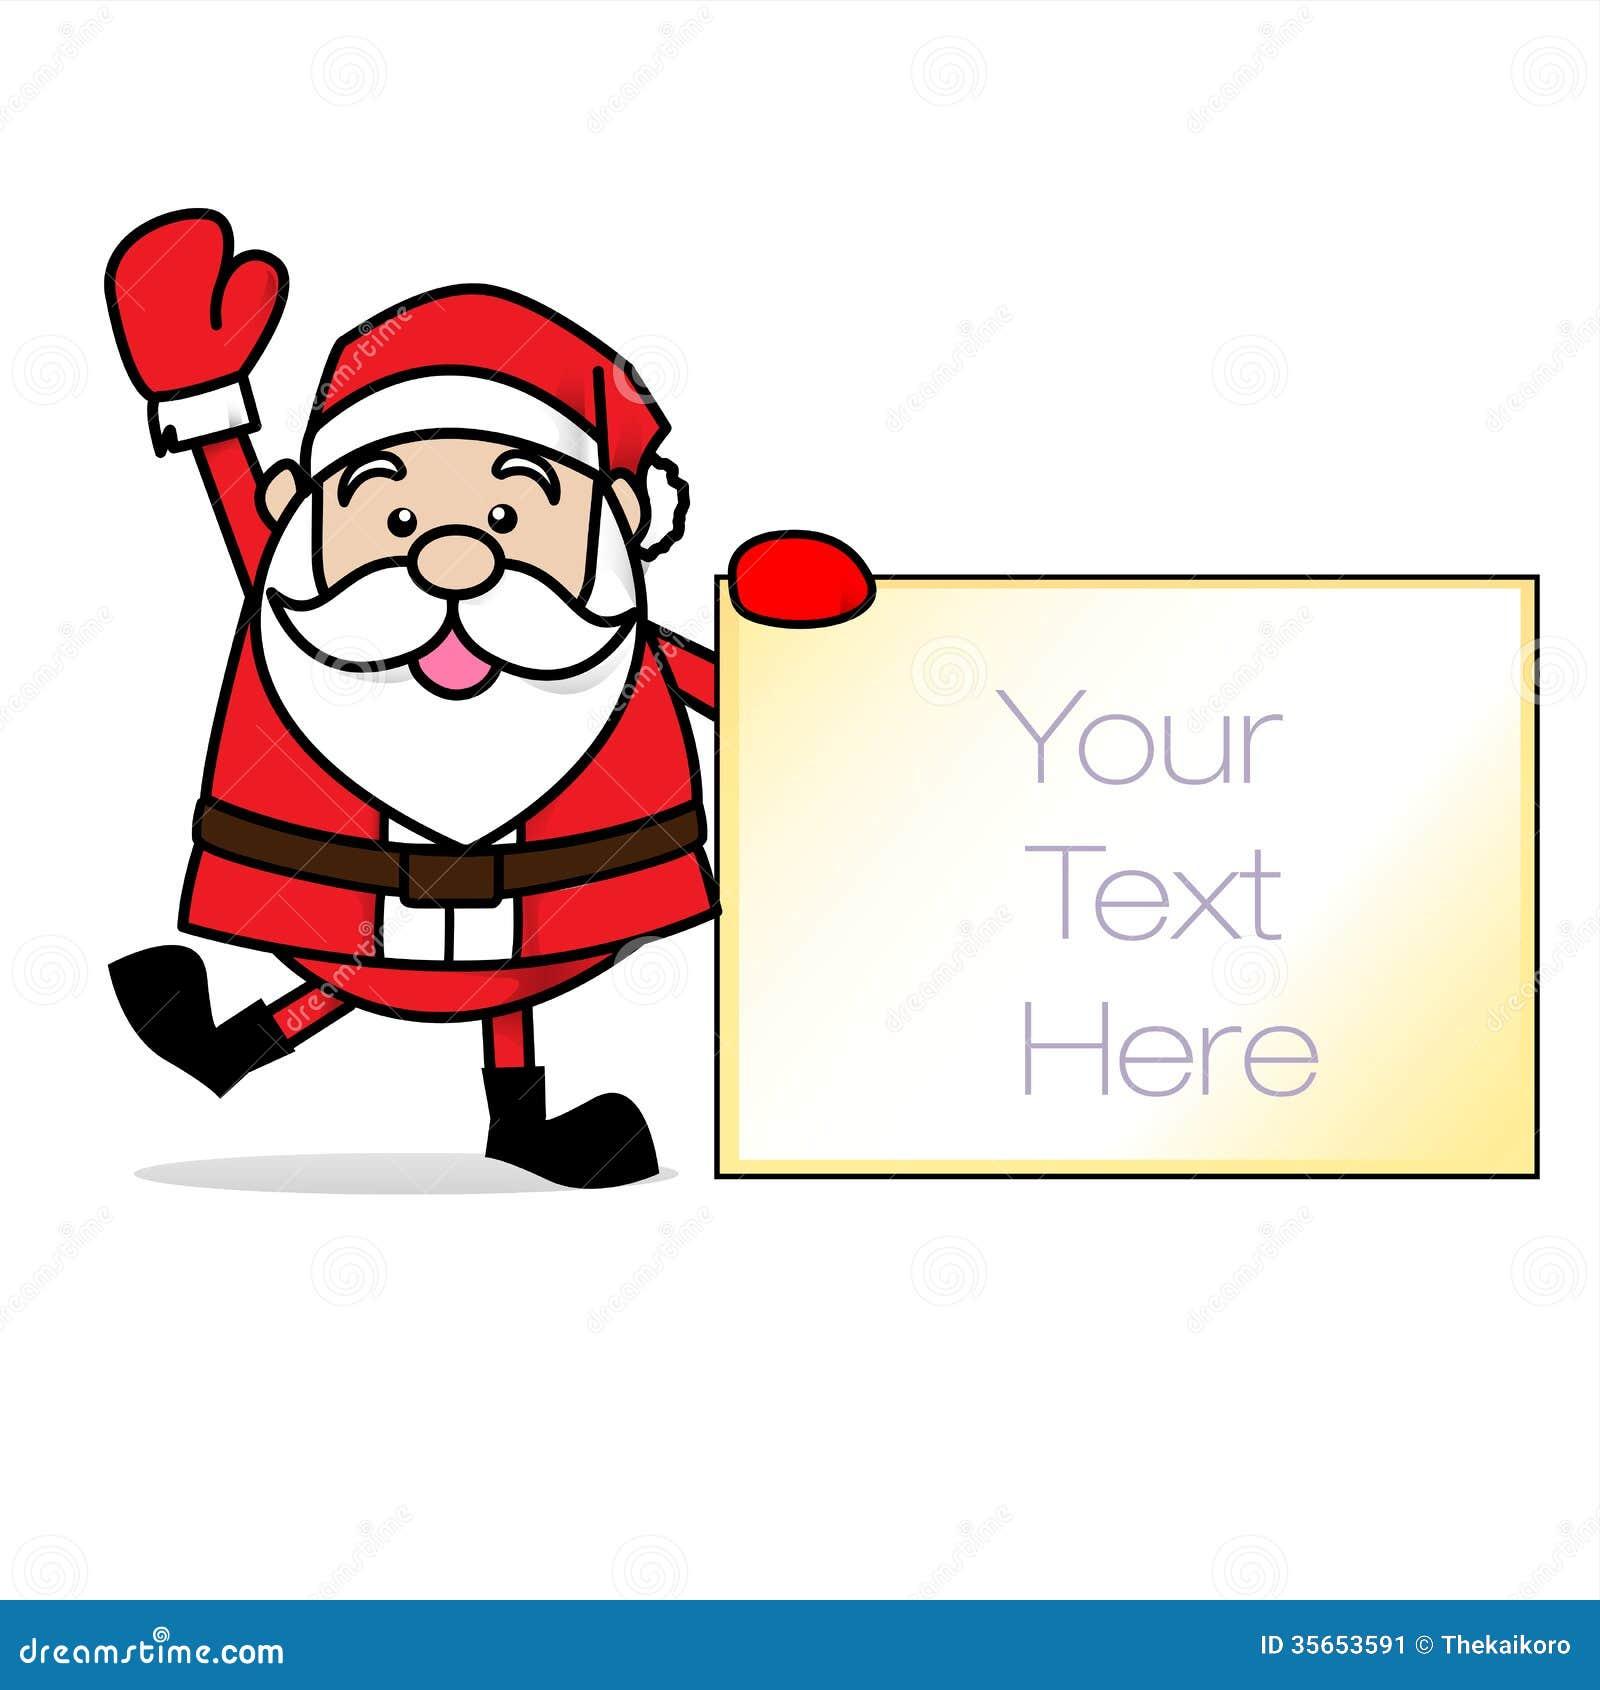 Christmas Photo Of Santa Claus Holding His Naughty And Nice List